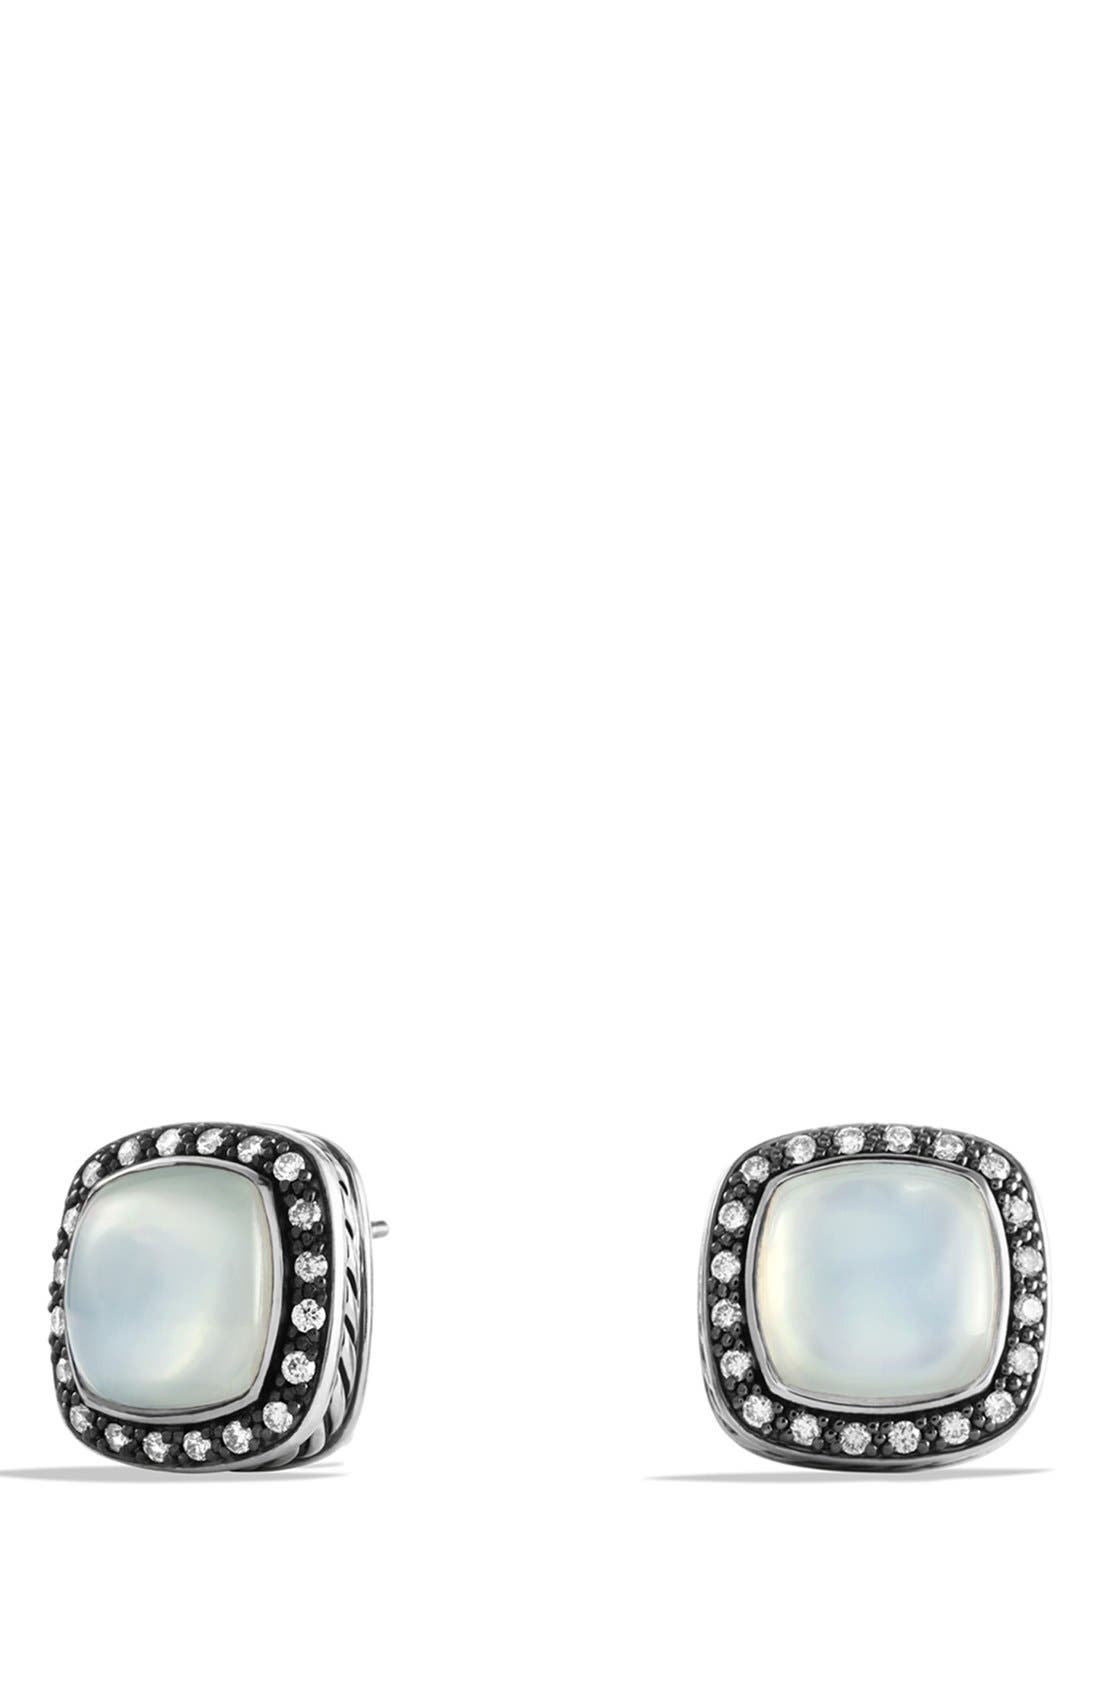 Alternate Image 1 Selected - David Yurman 'Midnight Mélange' Pavé Diamond Earrings